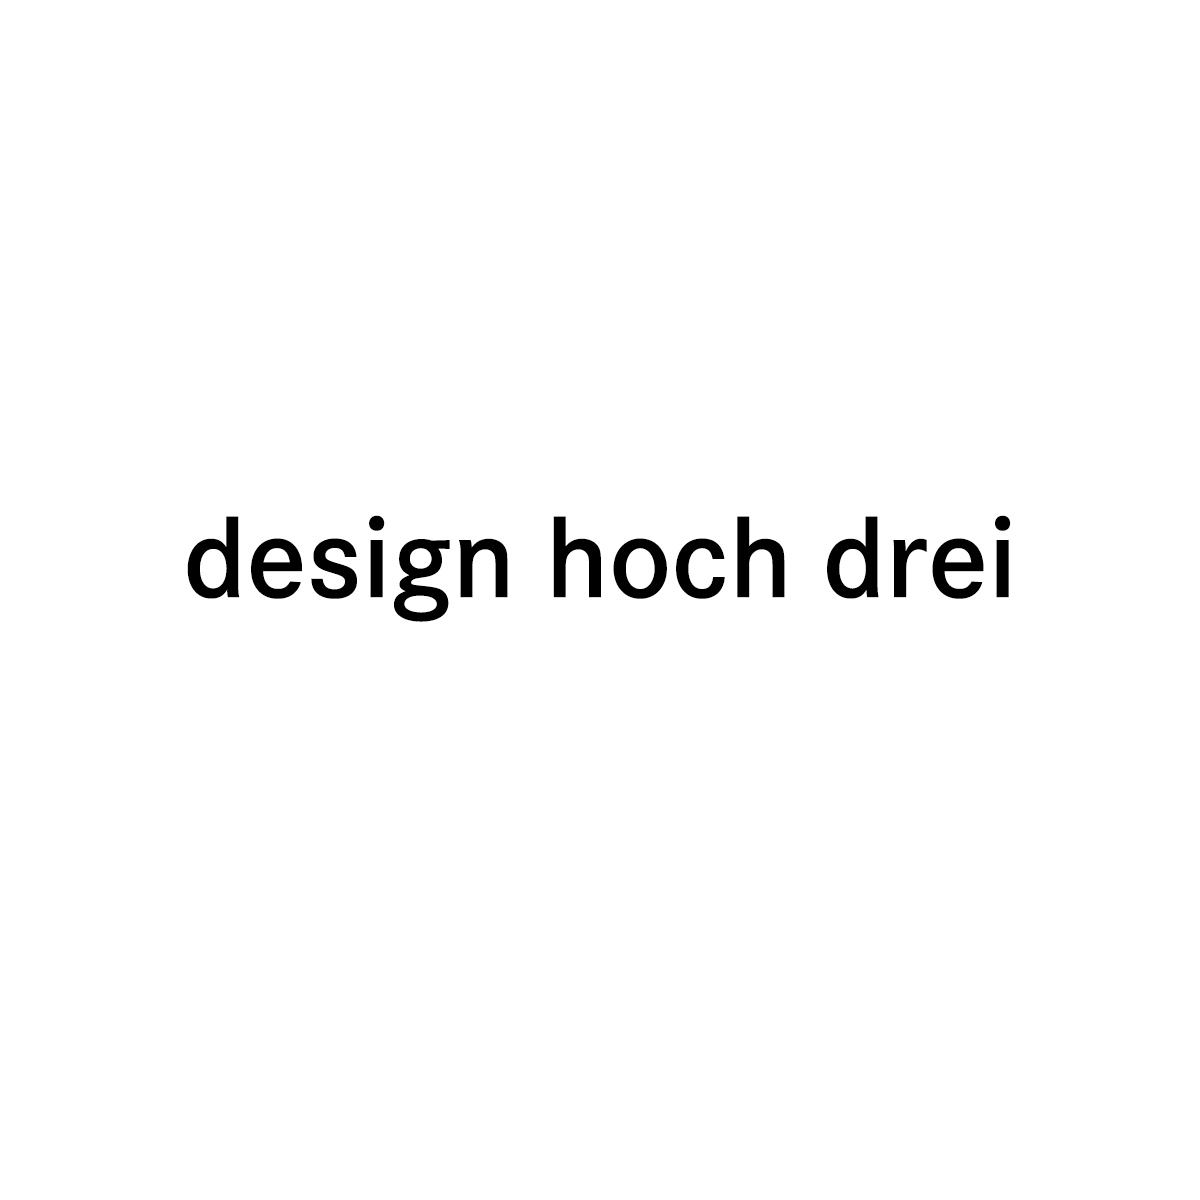 projekte seite 184 design hoch drei d3. Black Bedroom Furniture Sets. Home Design Ideas